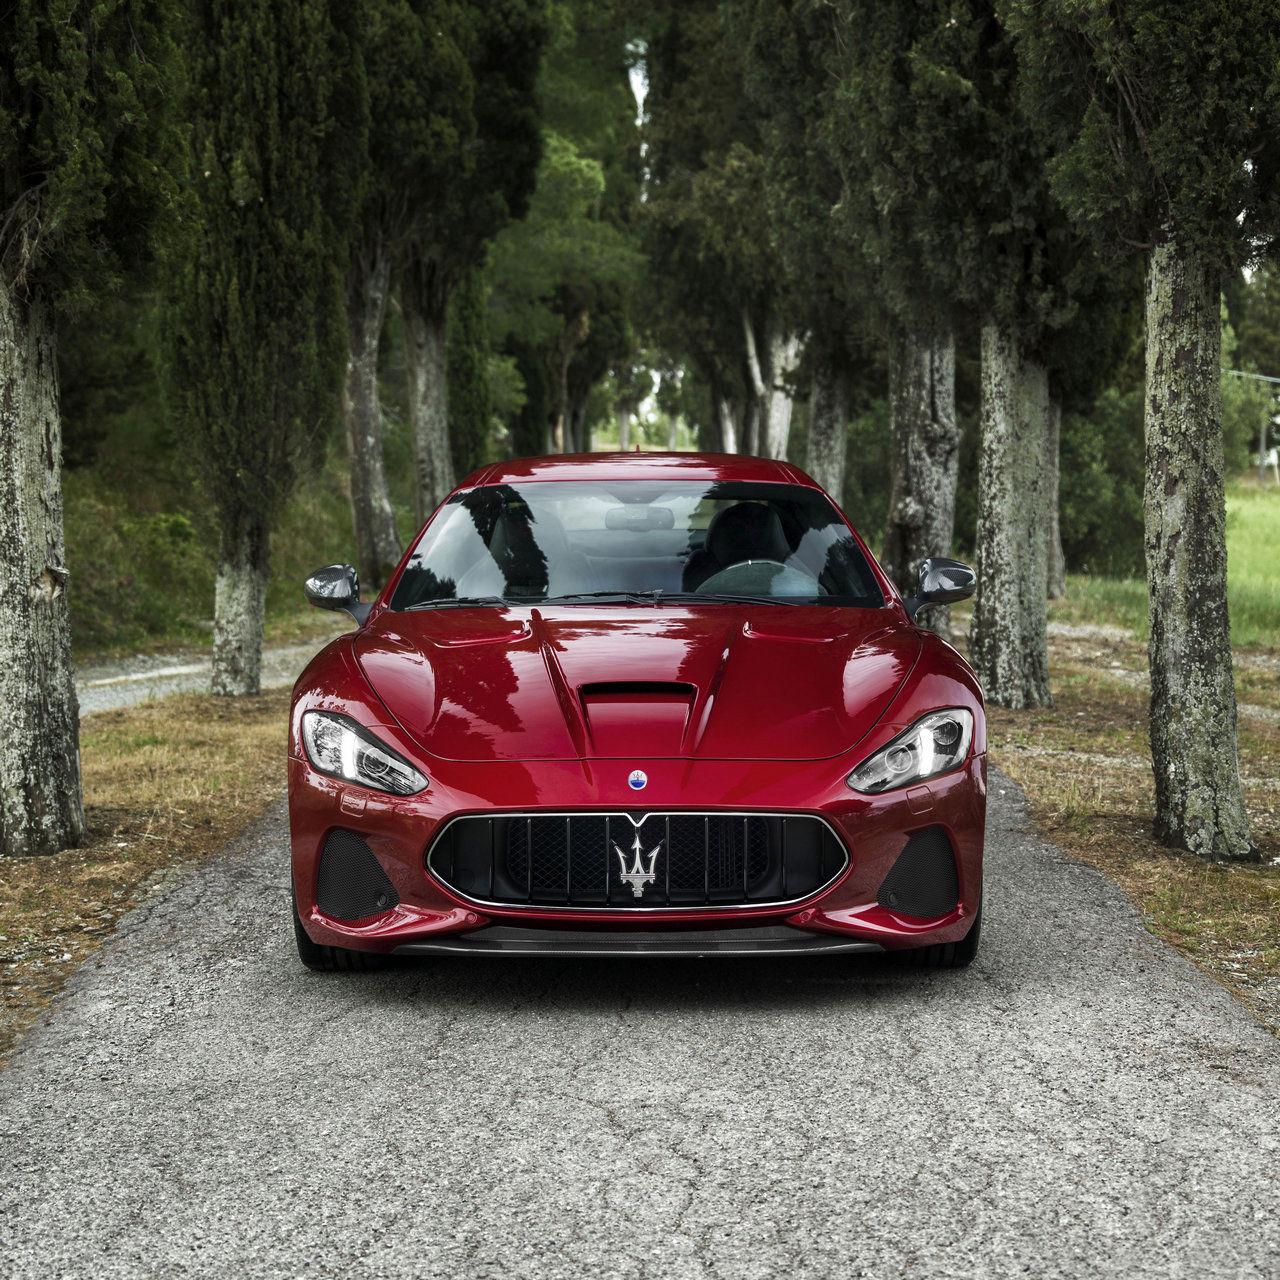 Maserati GranTurismo - Rot - Fahrwerk - Parkend